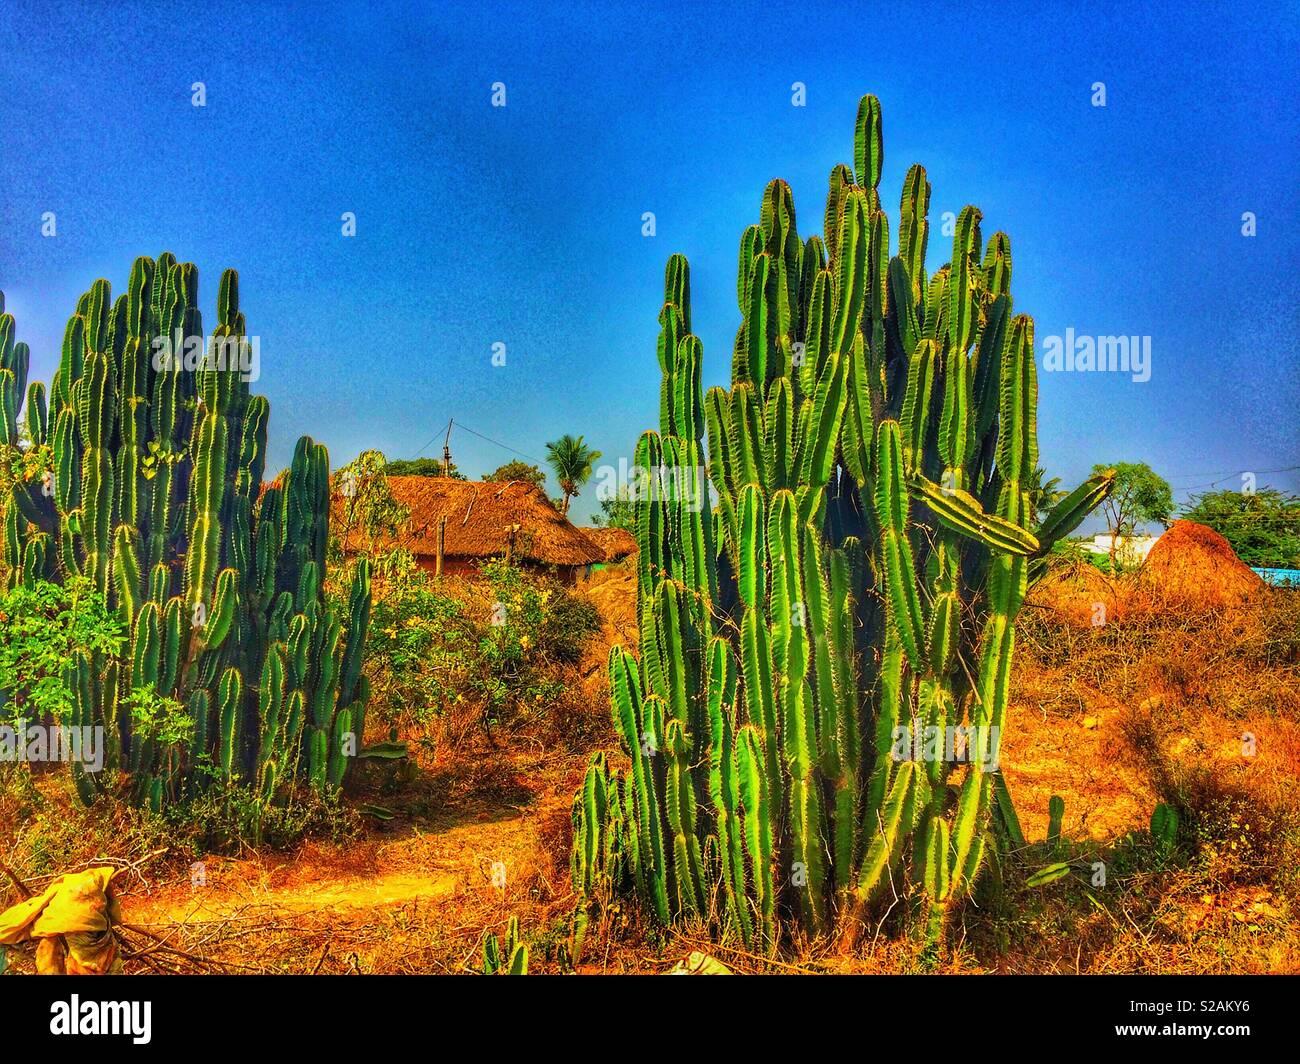 Cactuses in Indian savanah, Tiruvannamalai, India - Stock Image